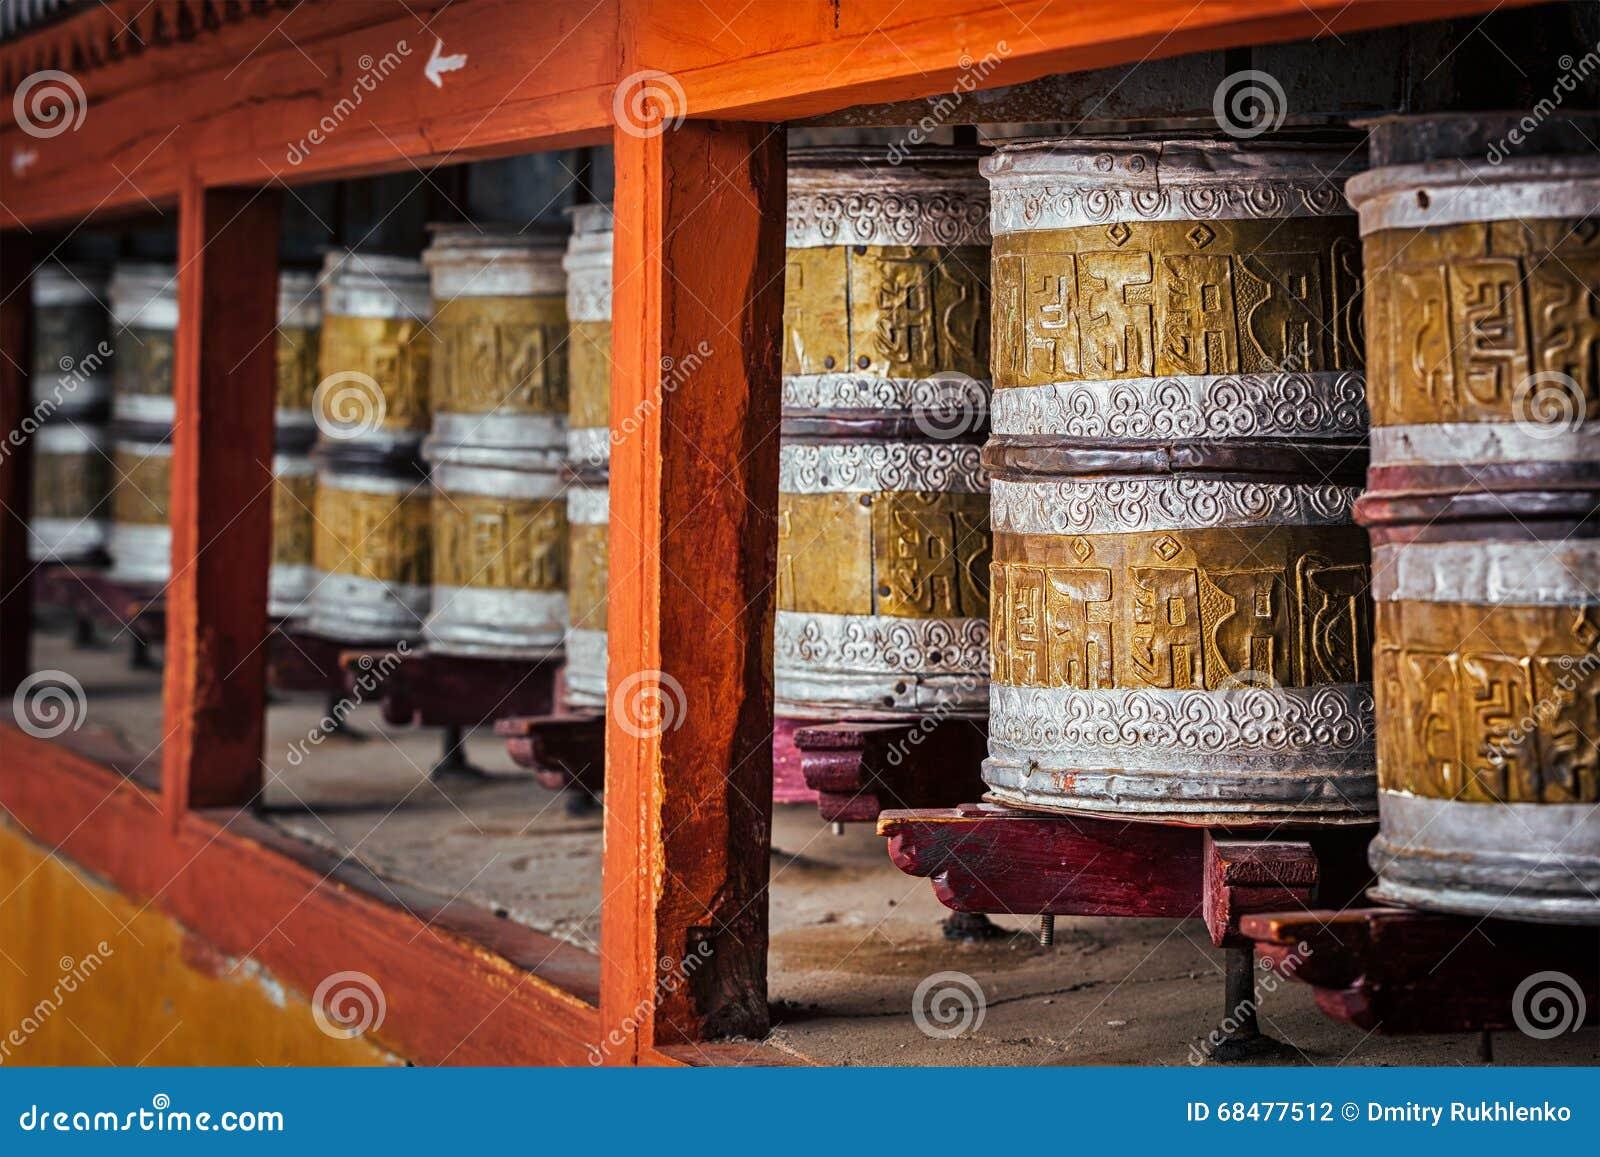 Буддийская молитва катит внутри monstery Hemis, Ladakh